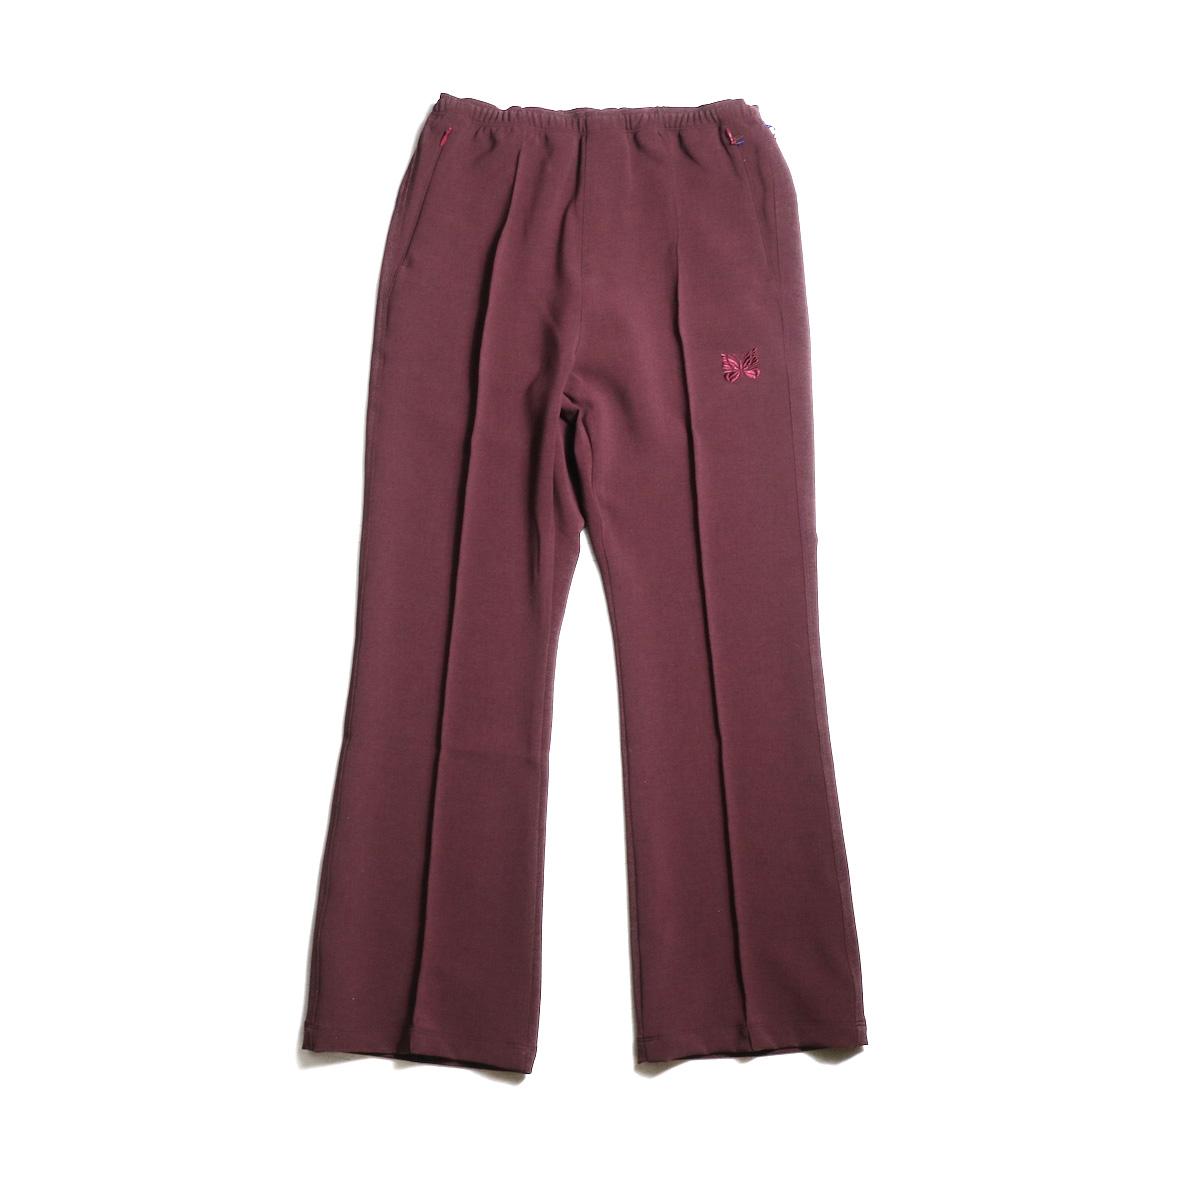 Needles / Warm-Up Boot-Cut Pant -Pe/W Sateen (Bordeaux)